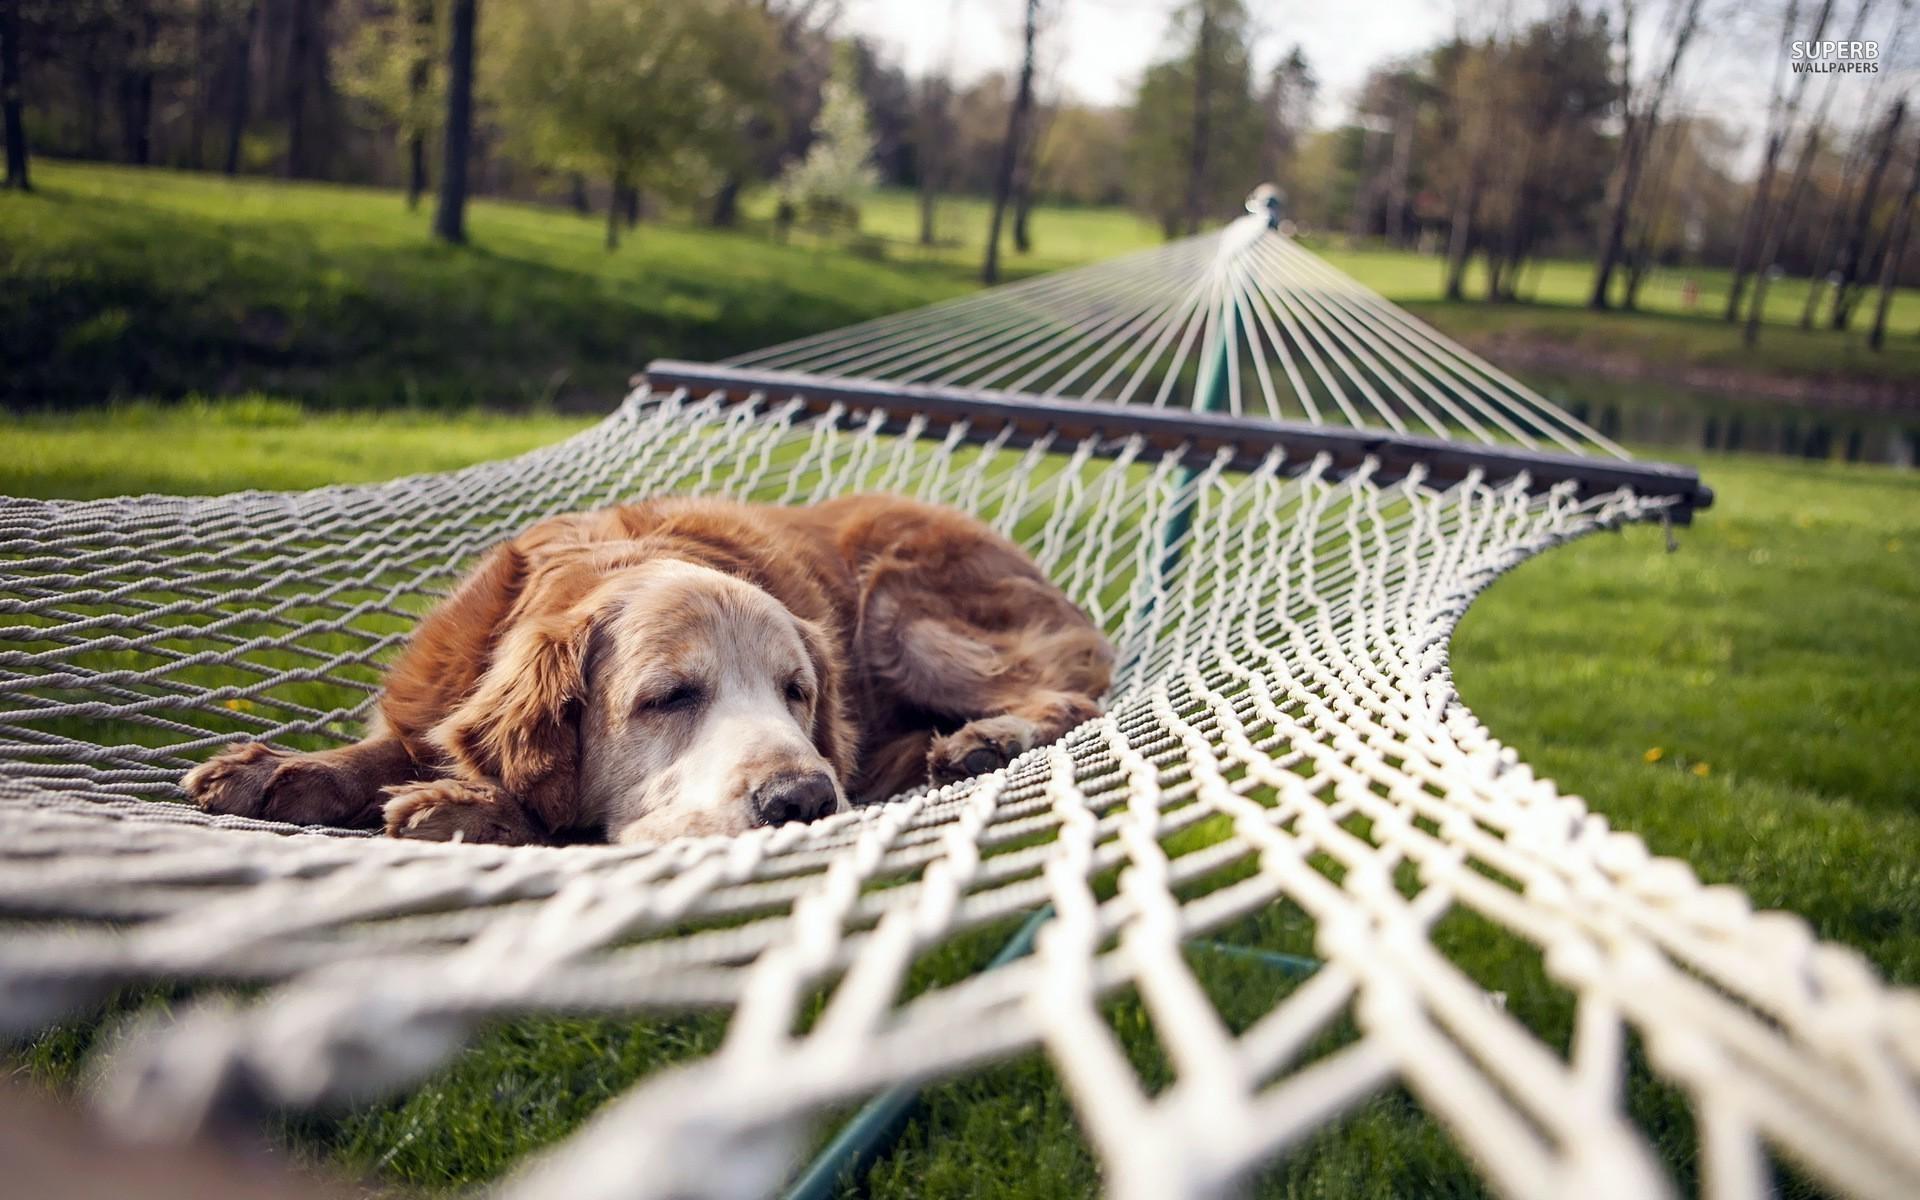 dog-resting-in-hammock-hd-wallpaper-89289